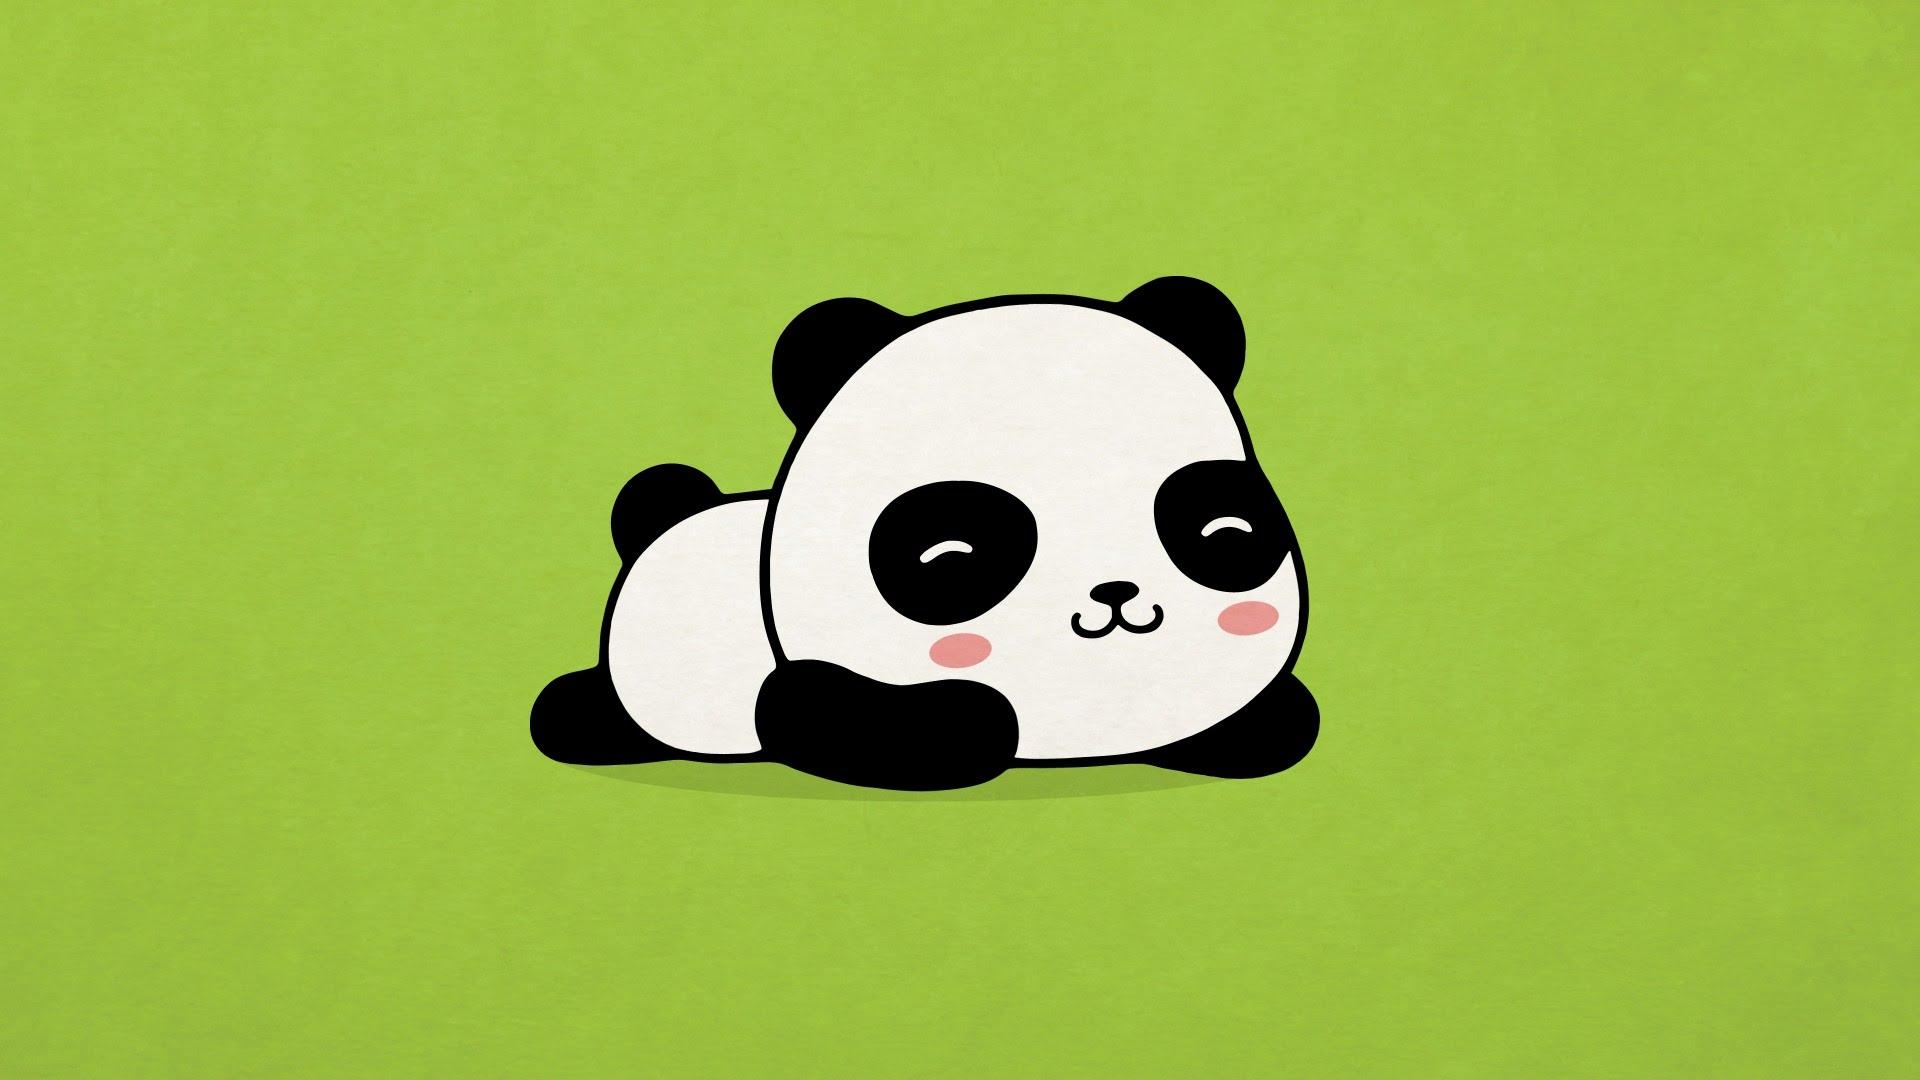 1920x1080 How To Draw] A Cute Sleepy Panda